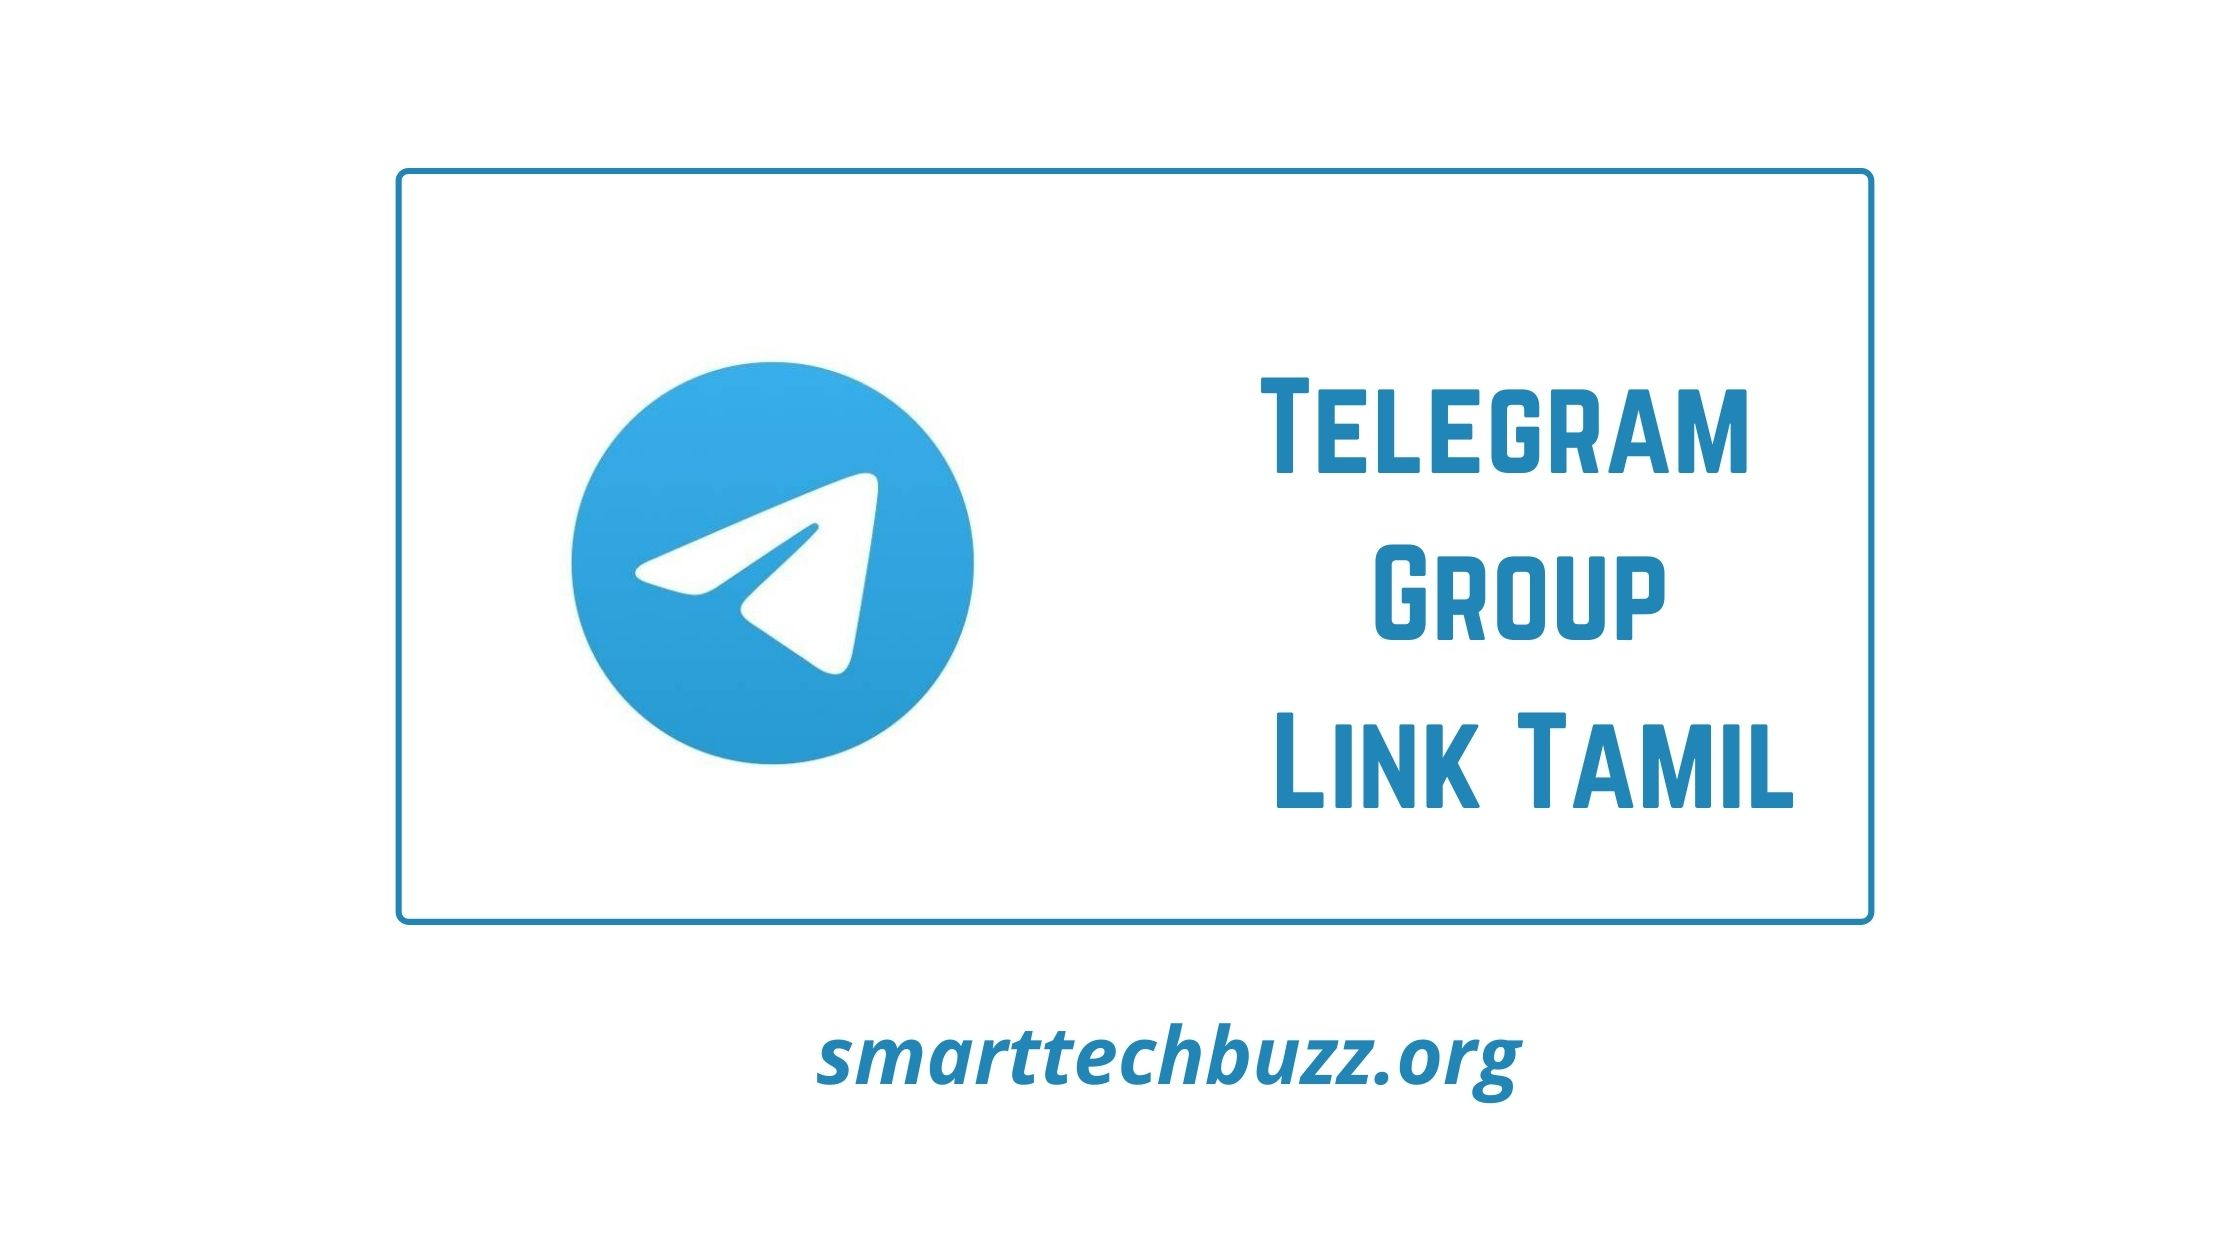 Telegram Group Link Tamil Join 20+ Tamil Telegram Groups